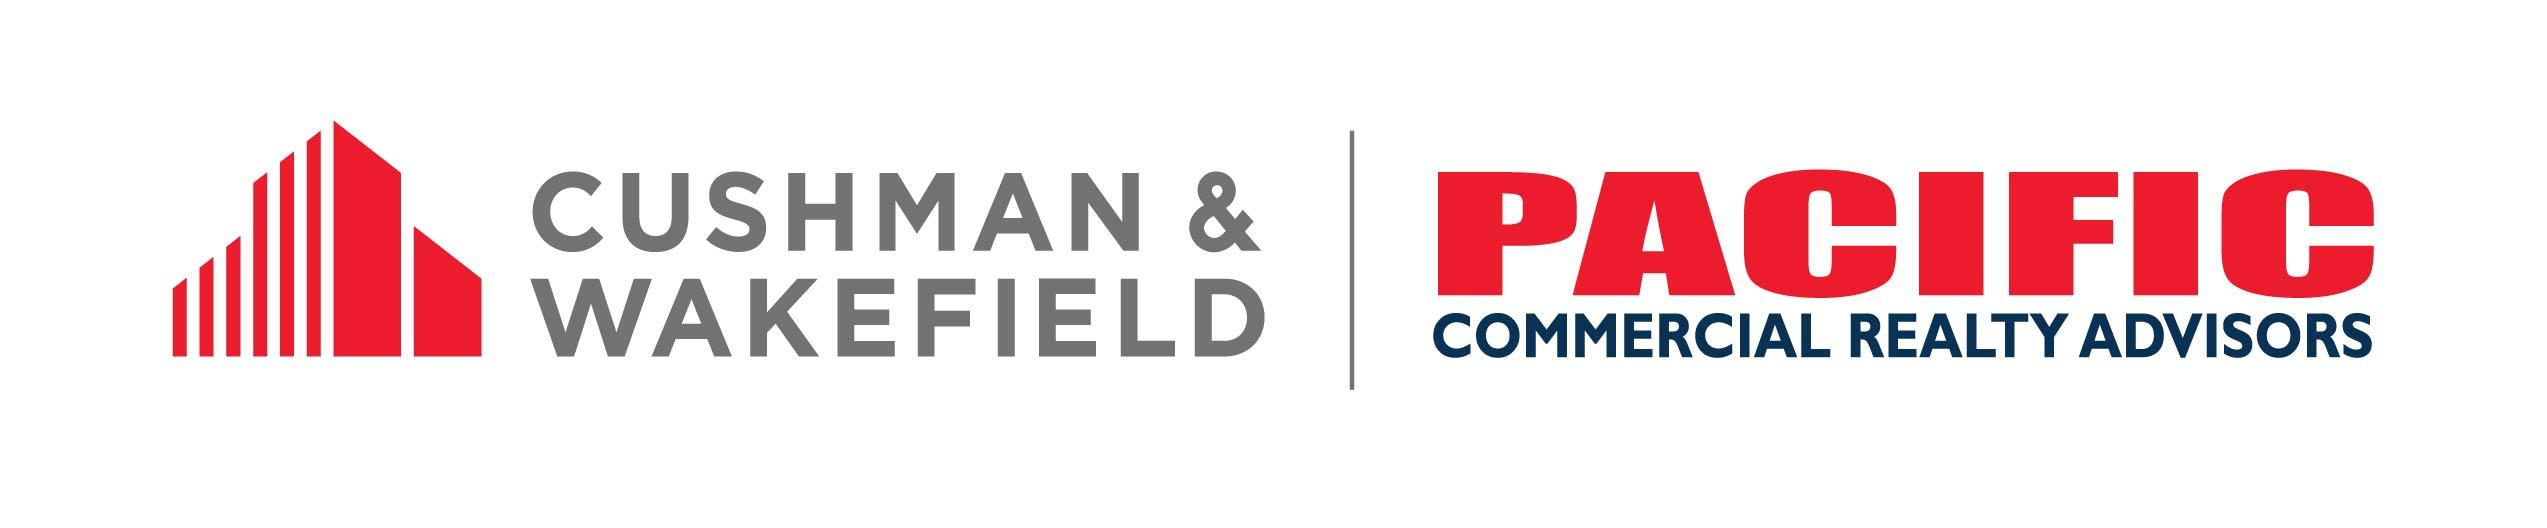 cushman amp wakefield pacific commerce realty advisors